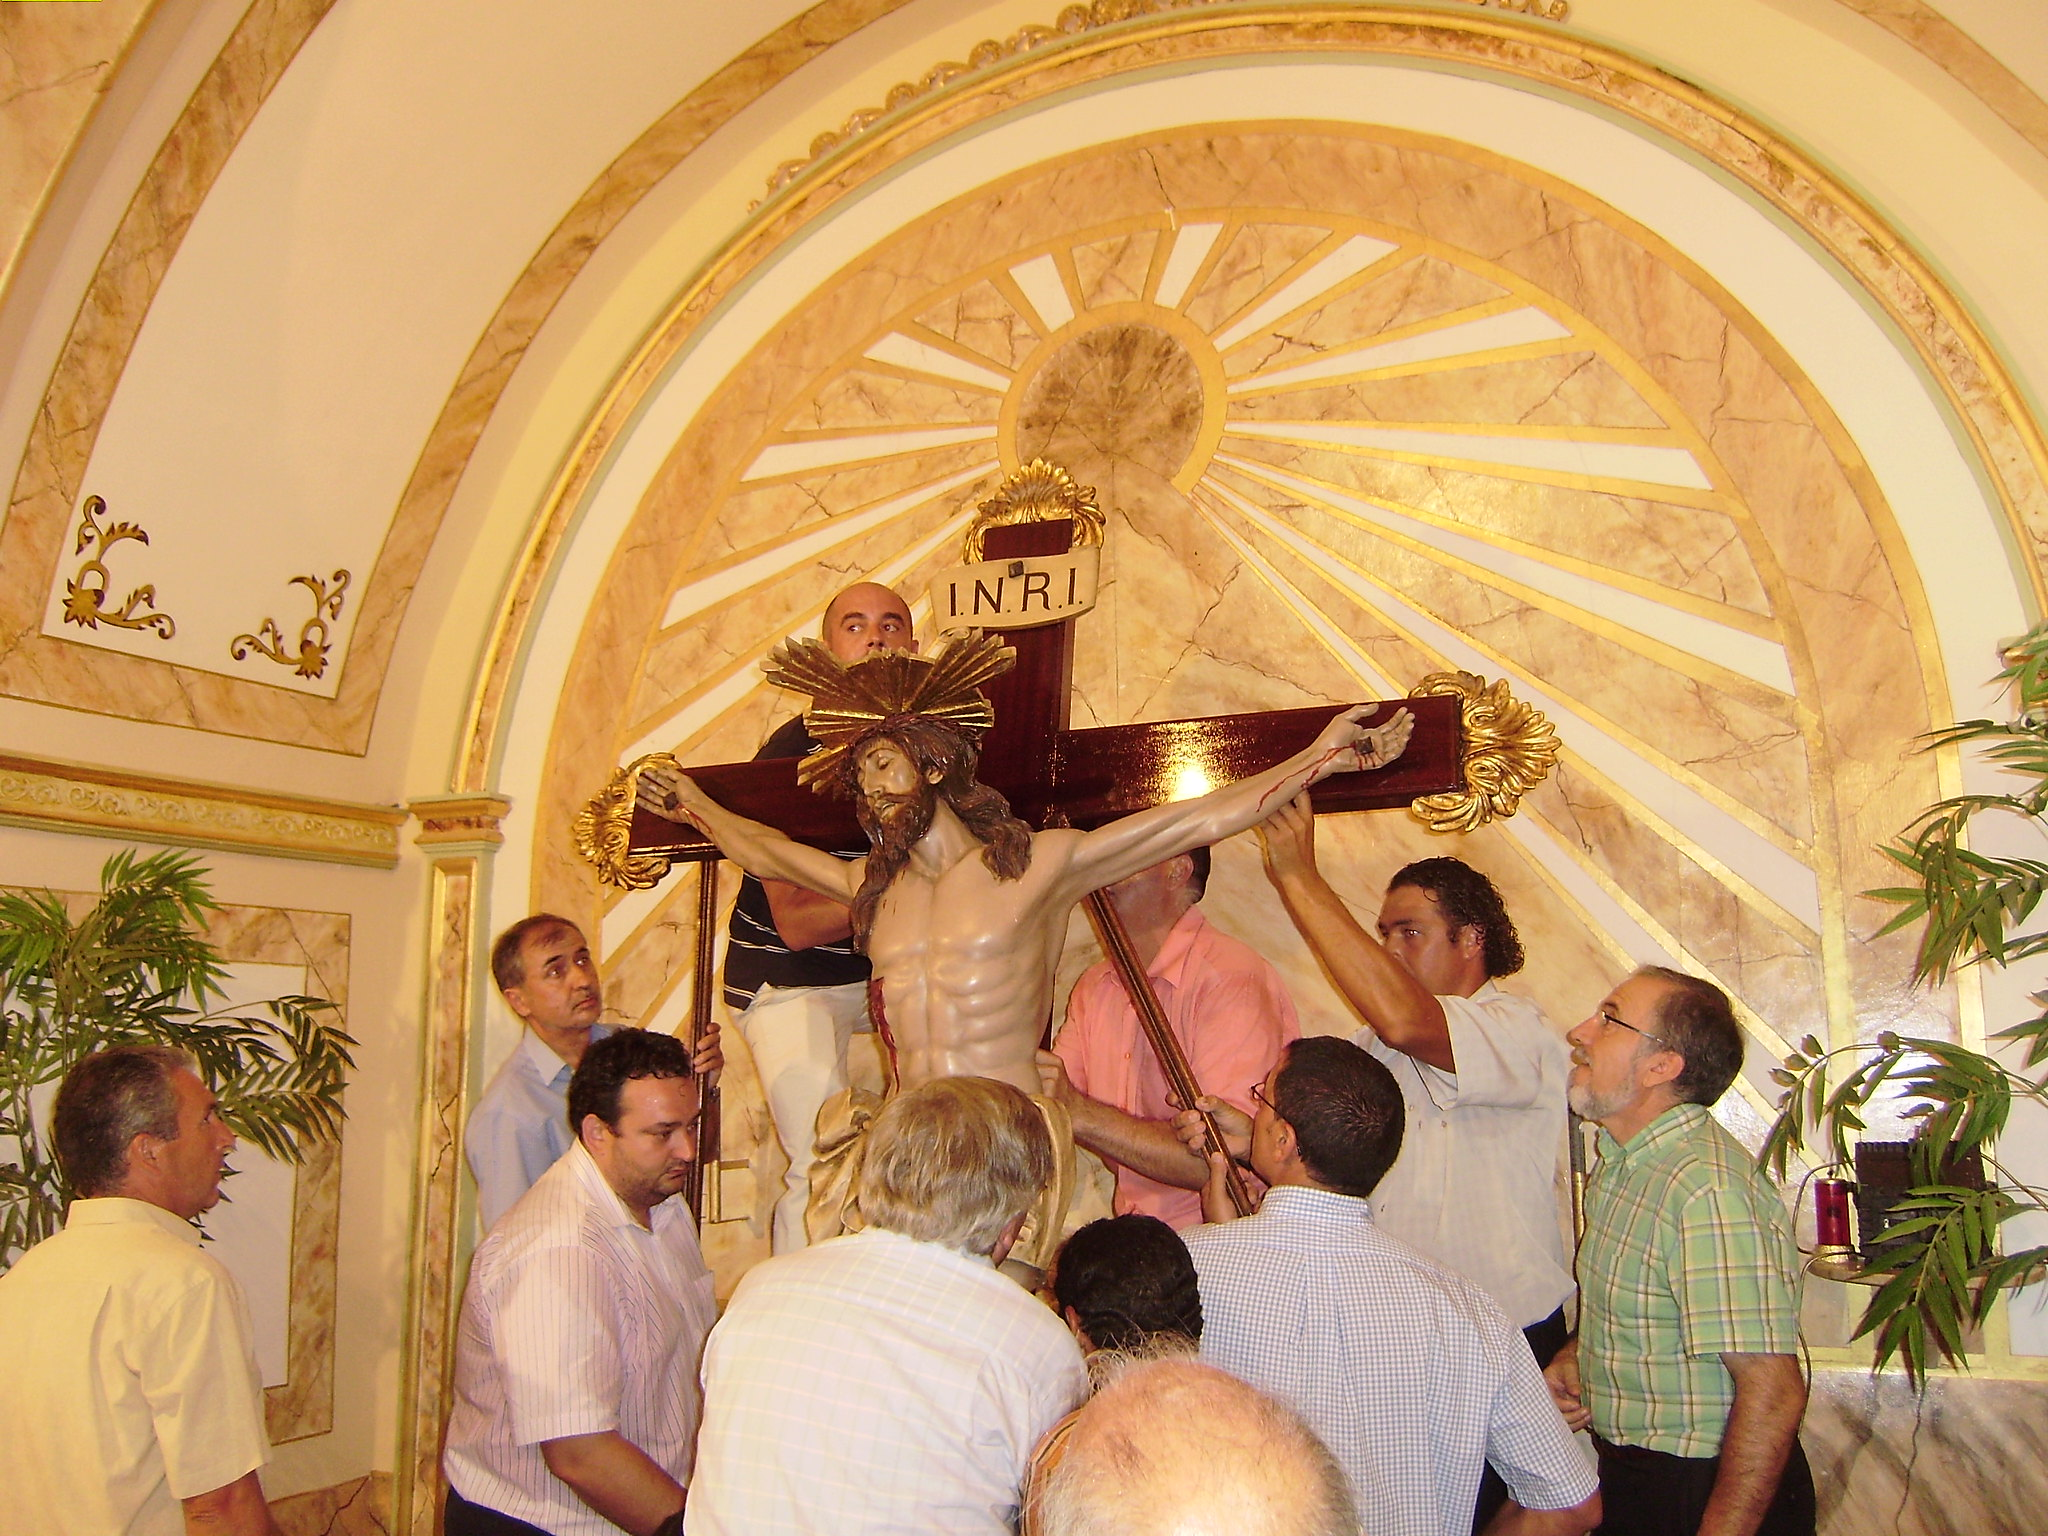 (2009-07-05) - Procesión Subida - Javier Romero Ripoll - (25)